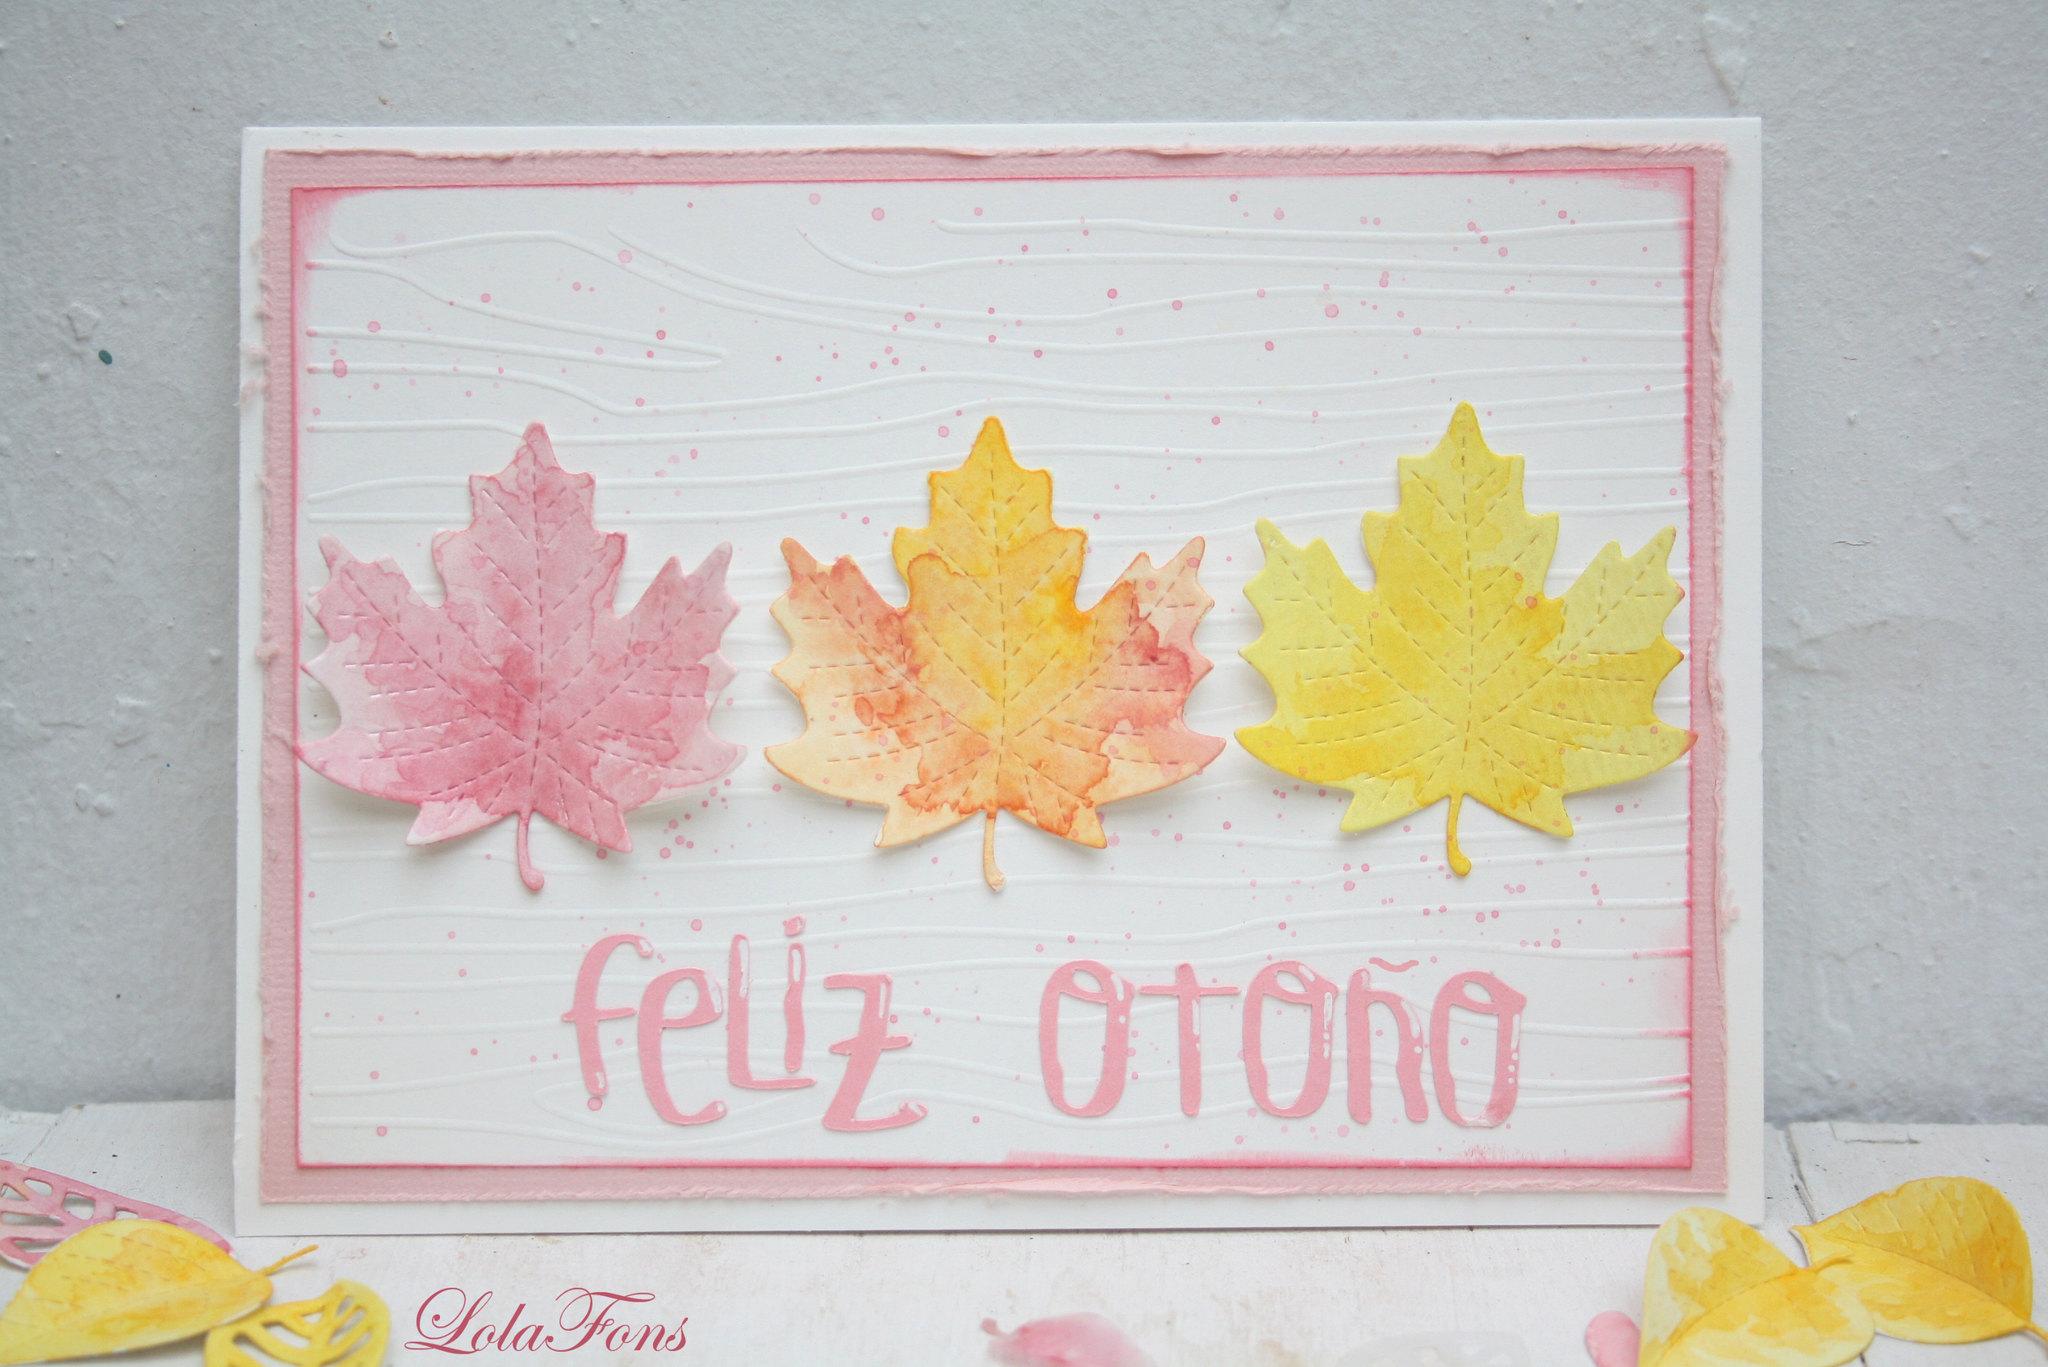 feliz_otoño9